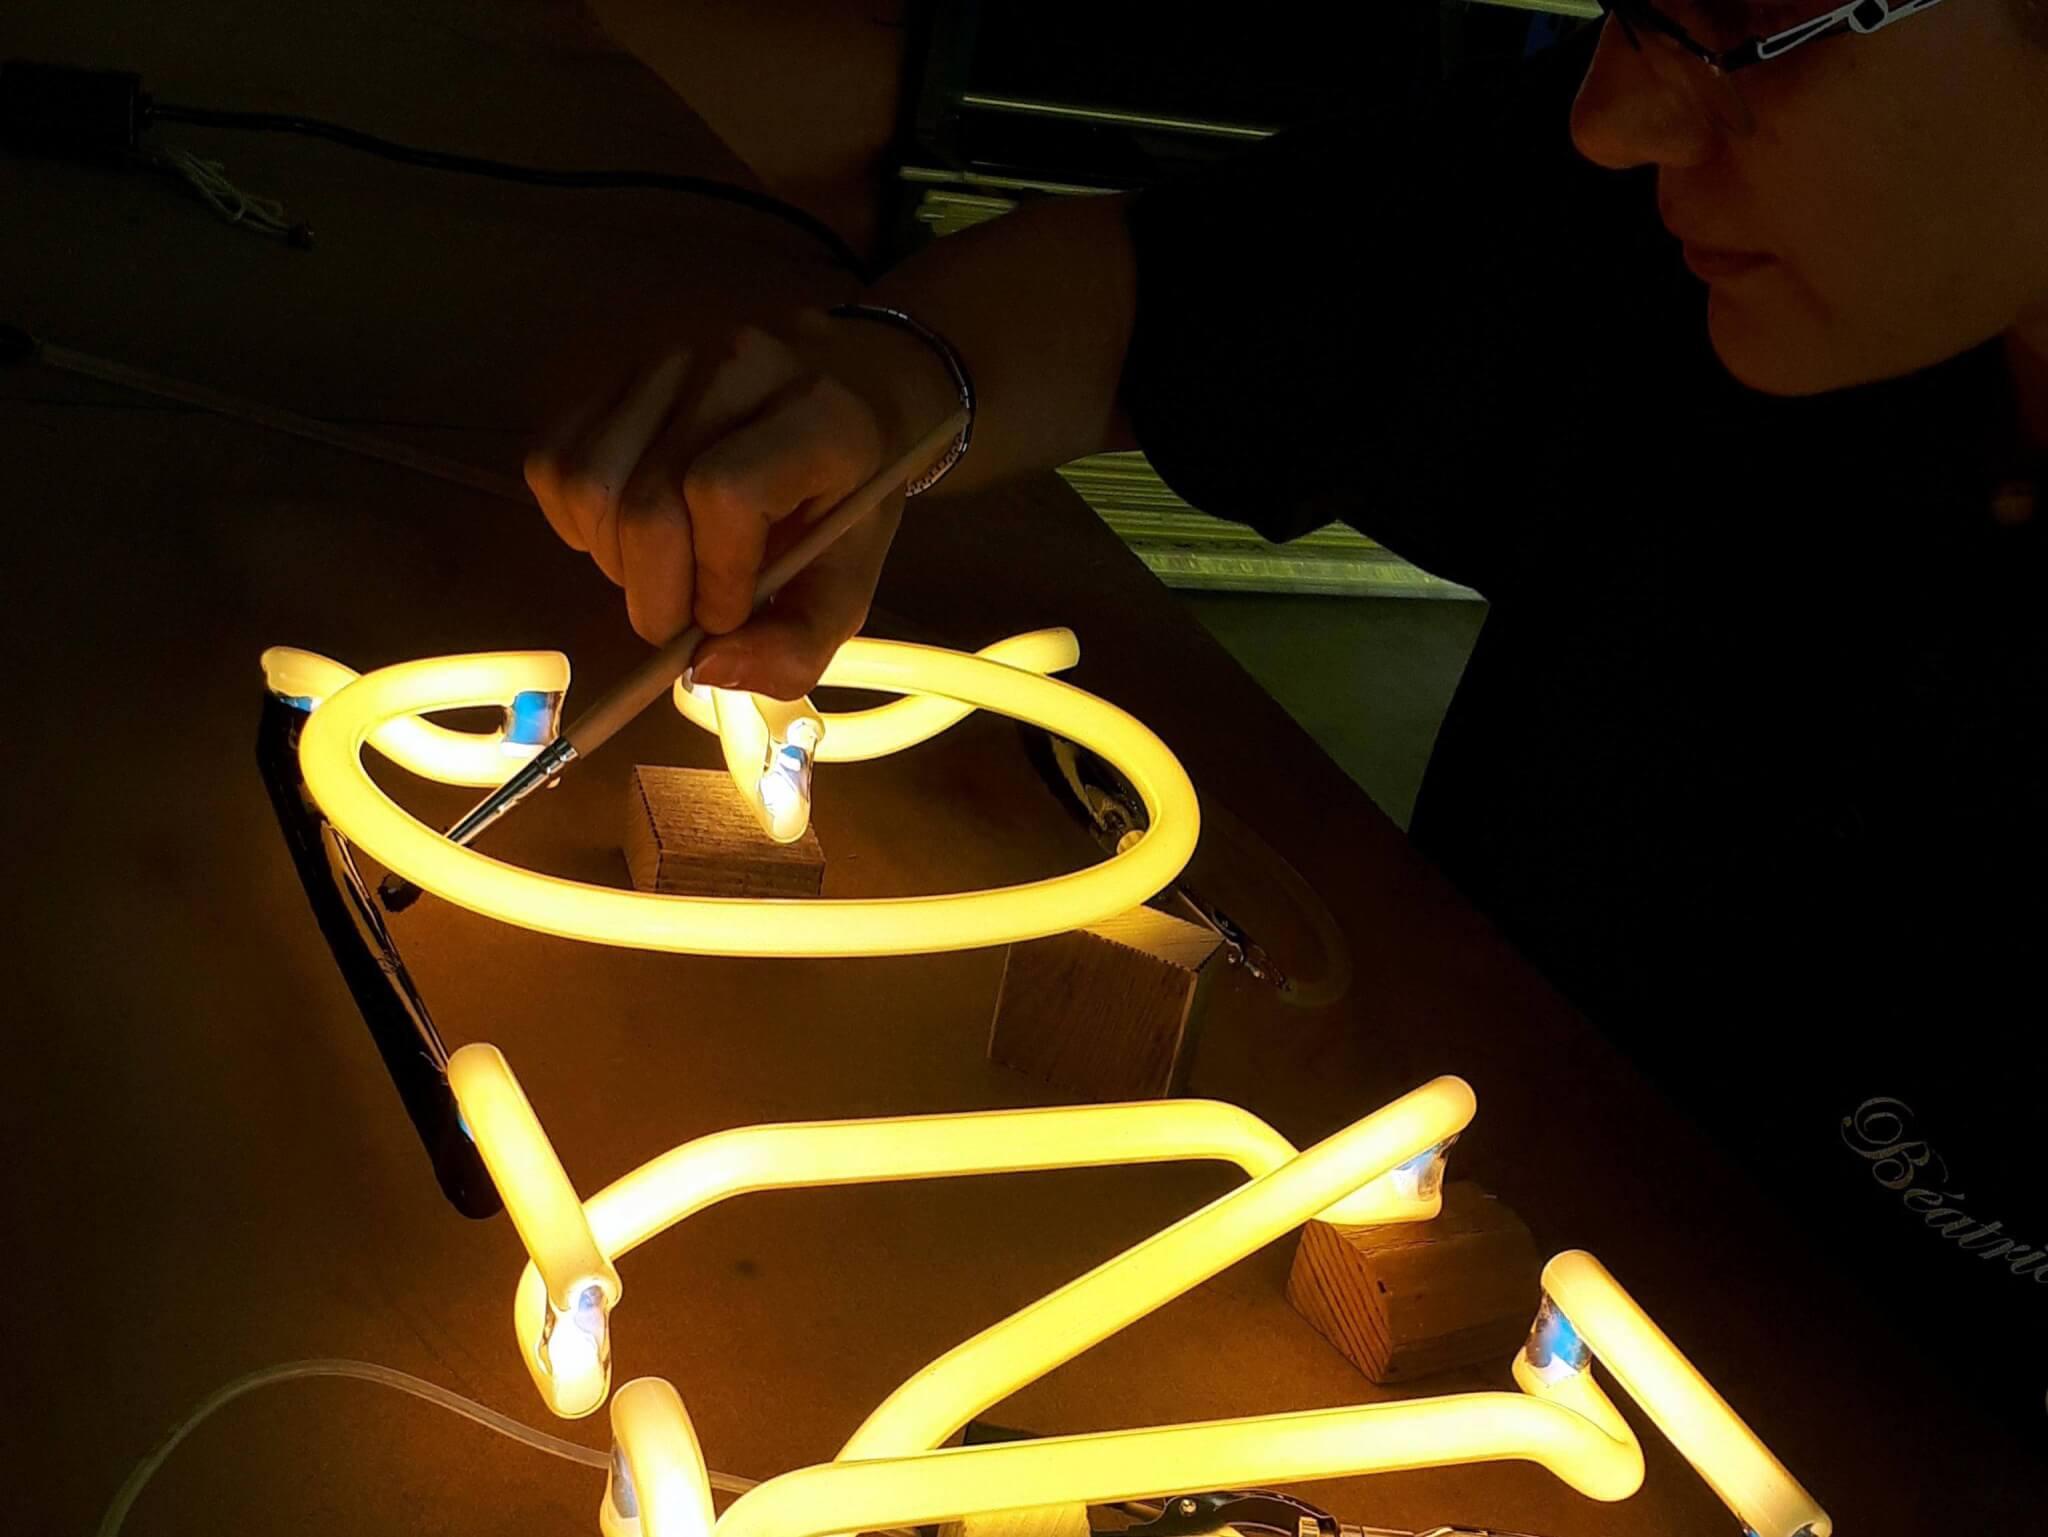 Enseignes lumineuses avec néons ou diodes